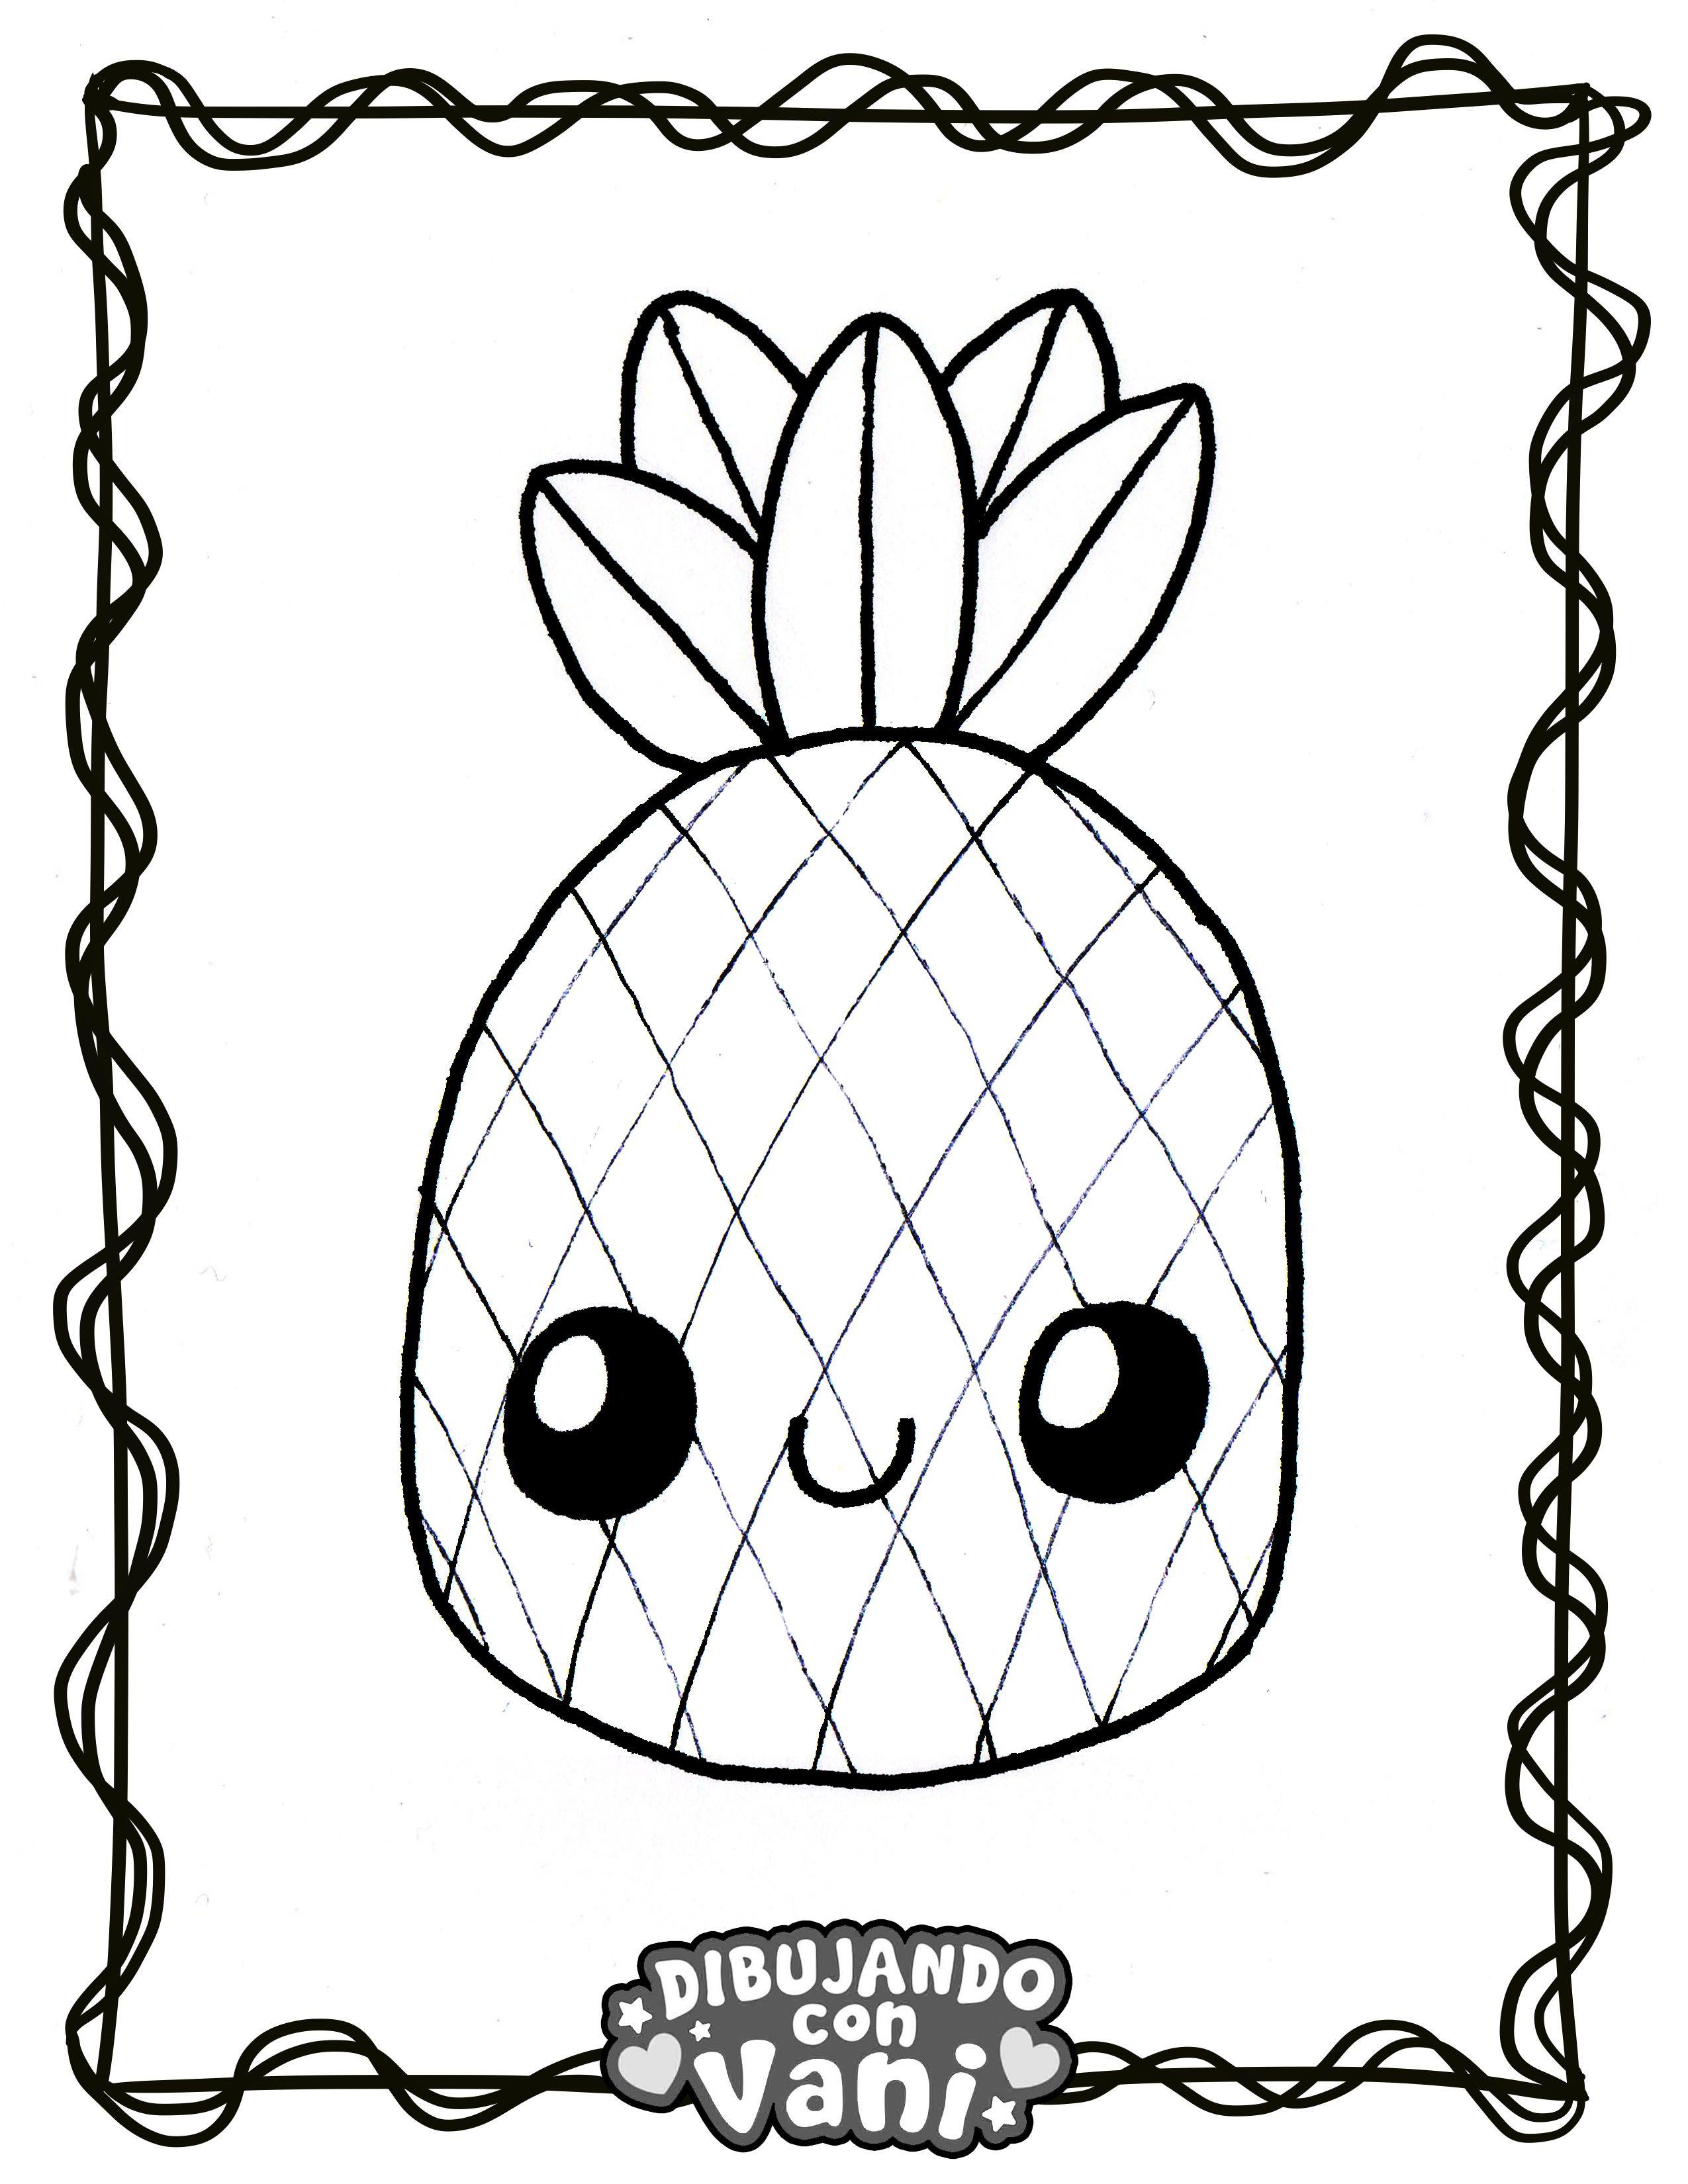 Pina Kawaii Dibujos Para Colorear Dibujos Y Dibujo De Pina